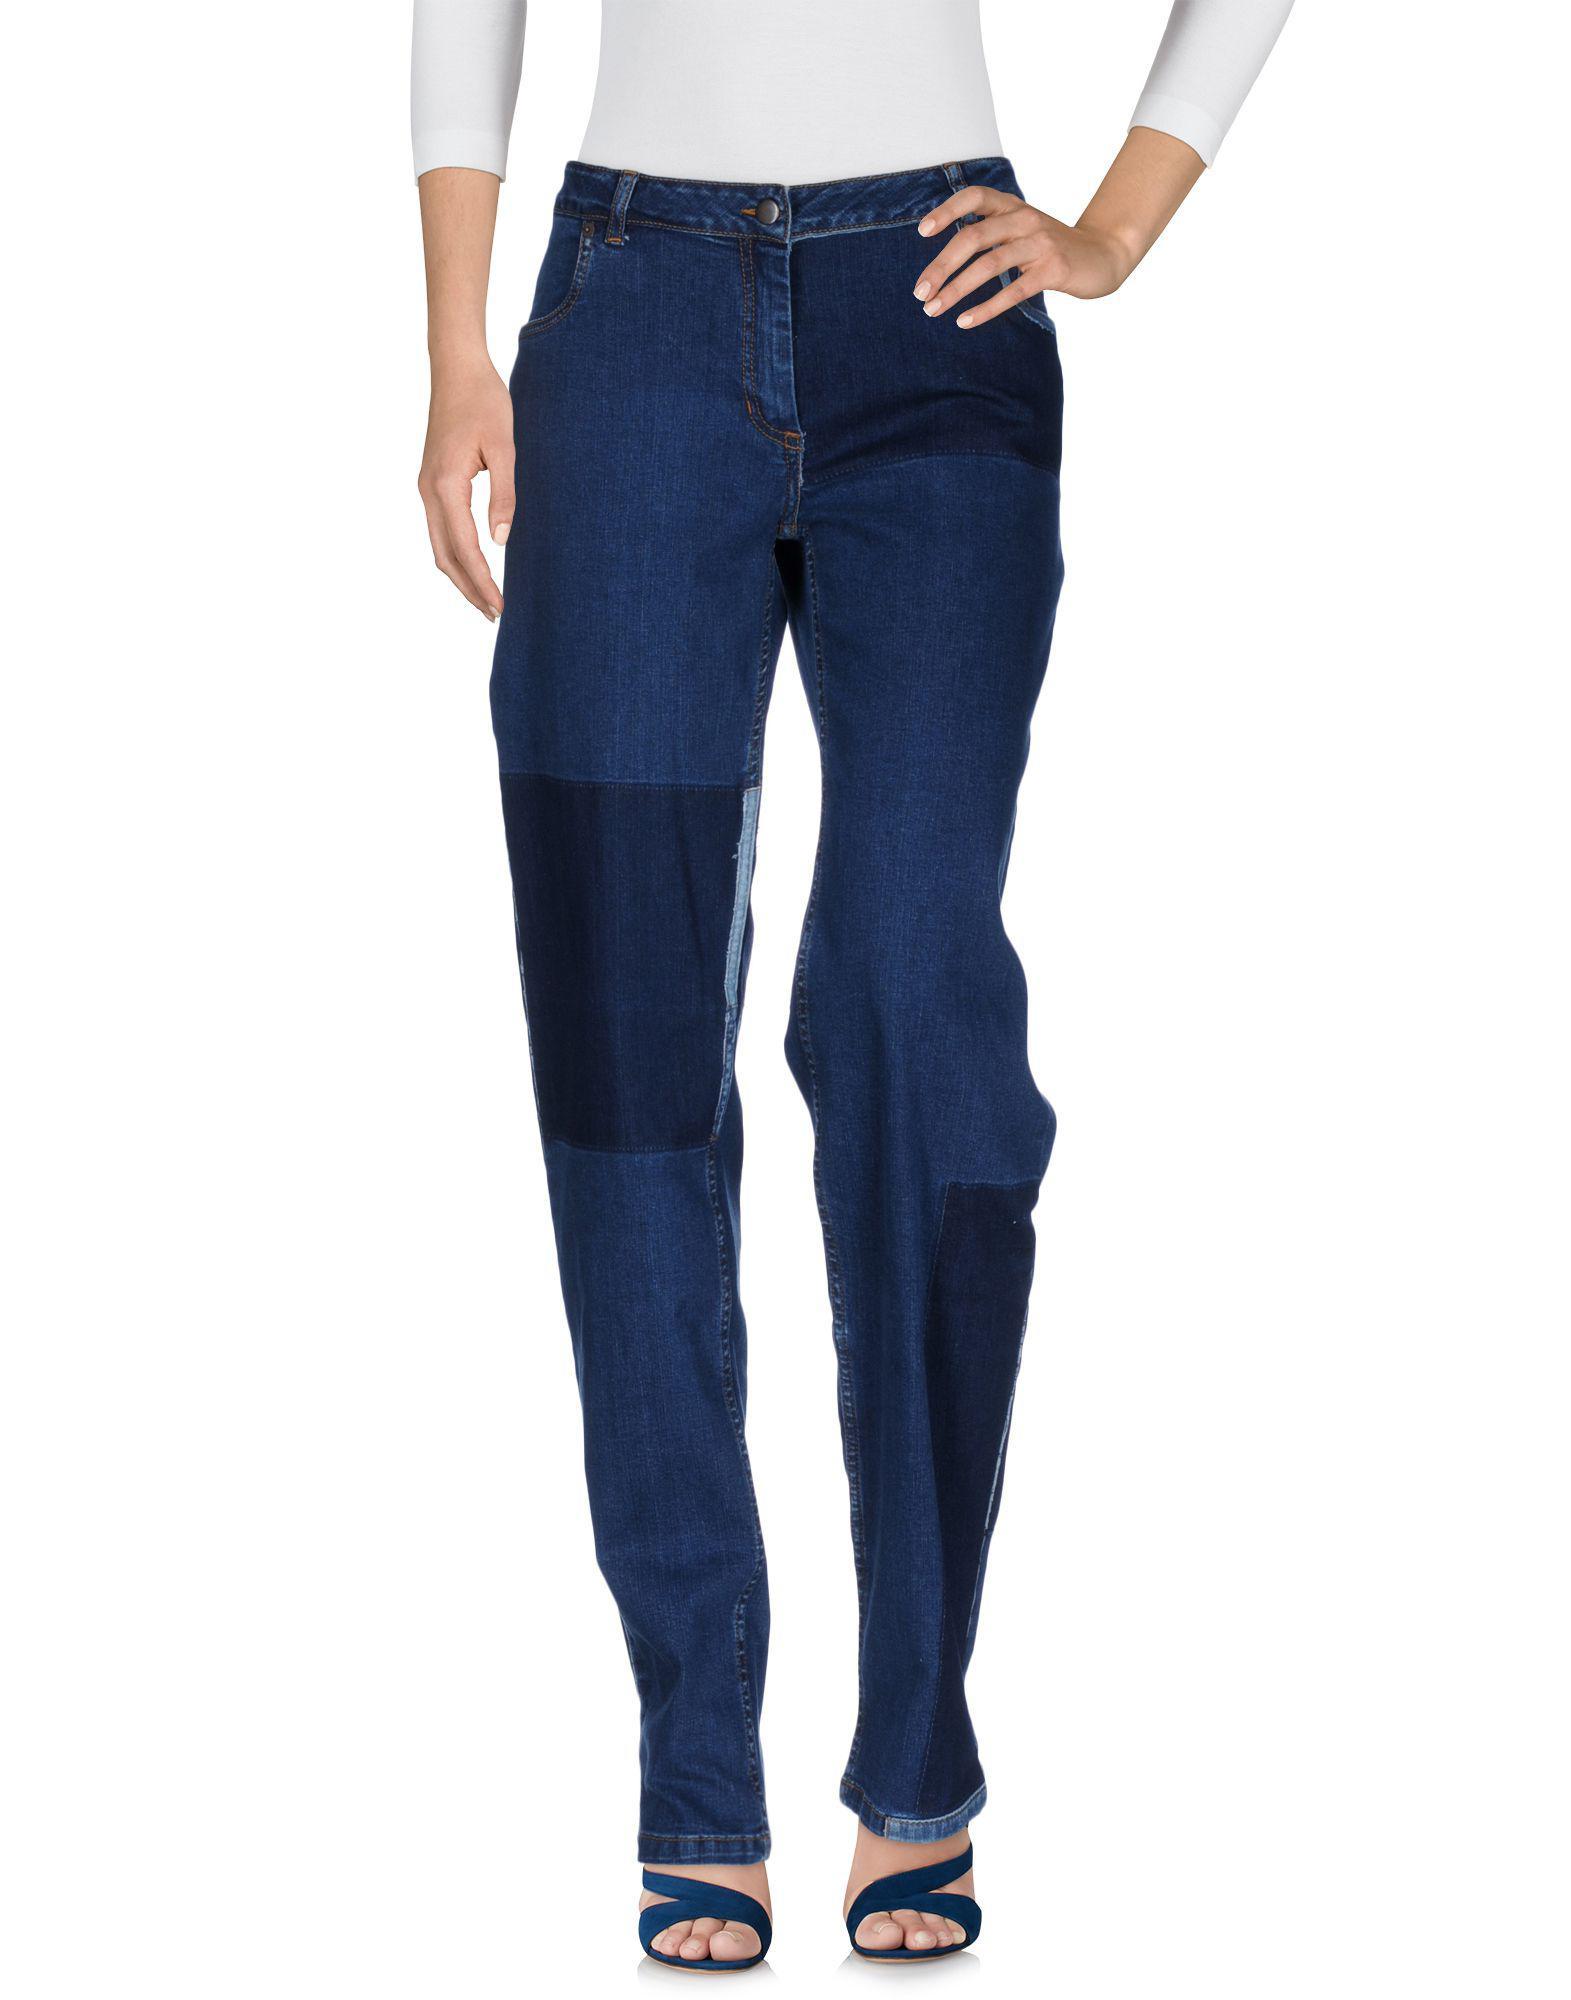 DENIM - Denim trousers Preen New Styles Online Outlet Excellent Oq5DTt5Dh